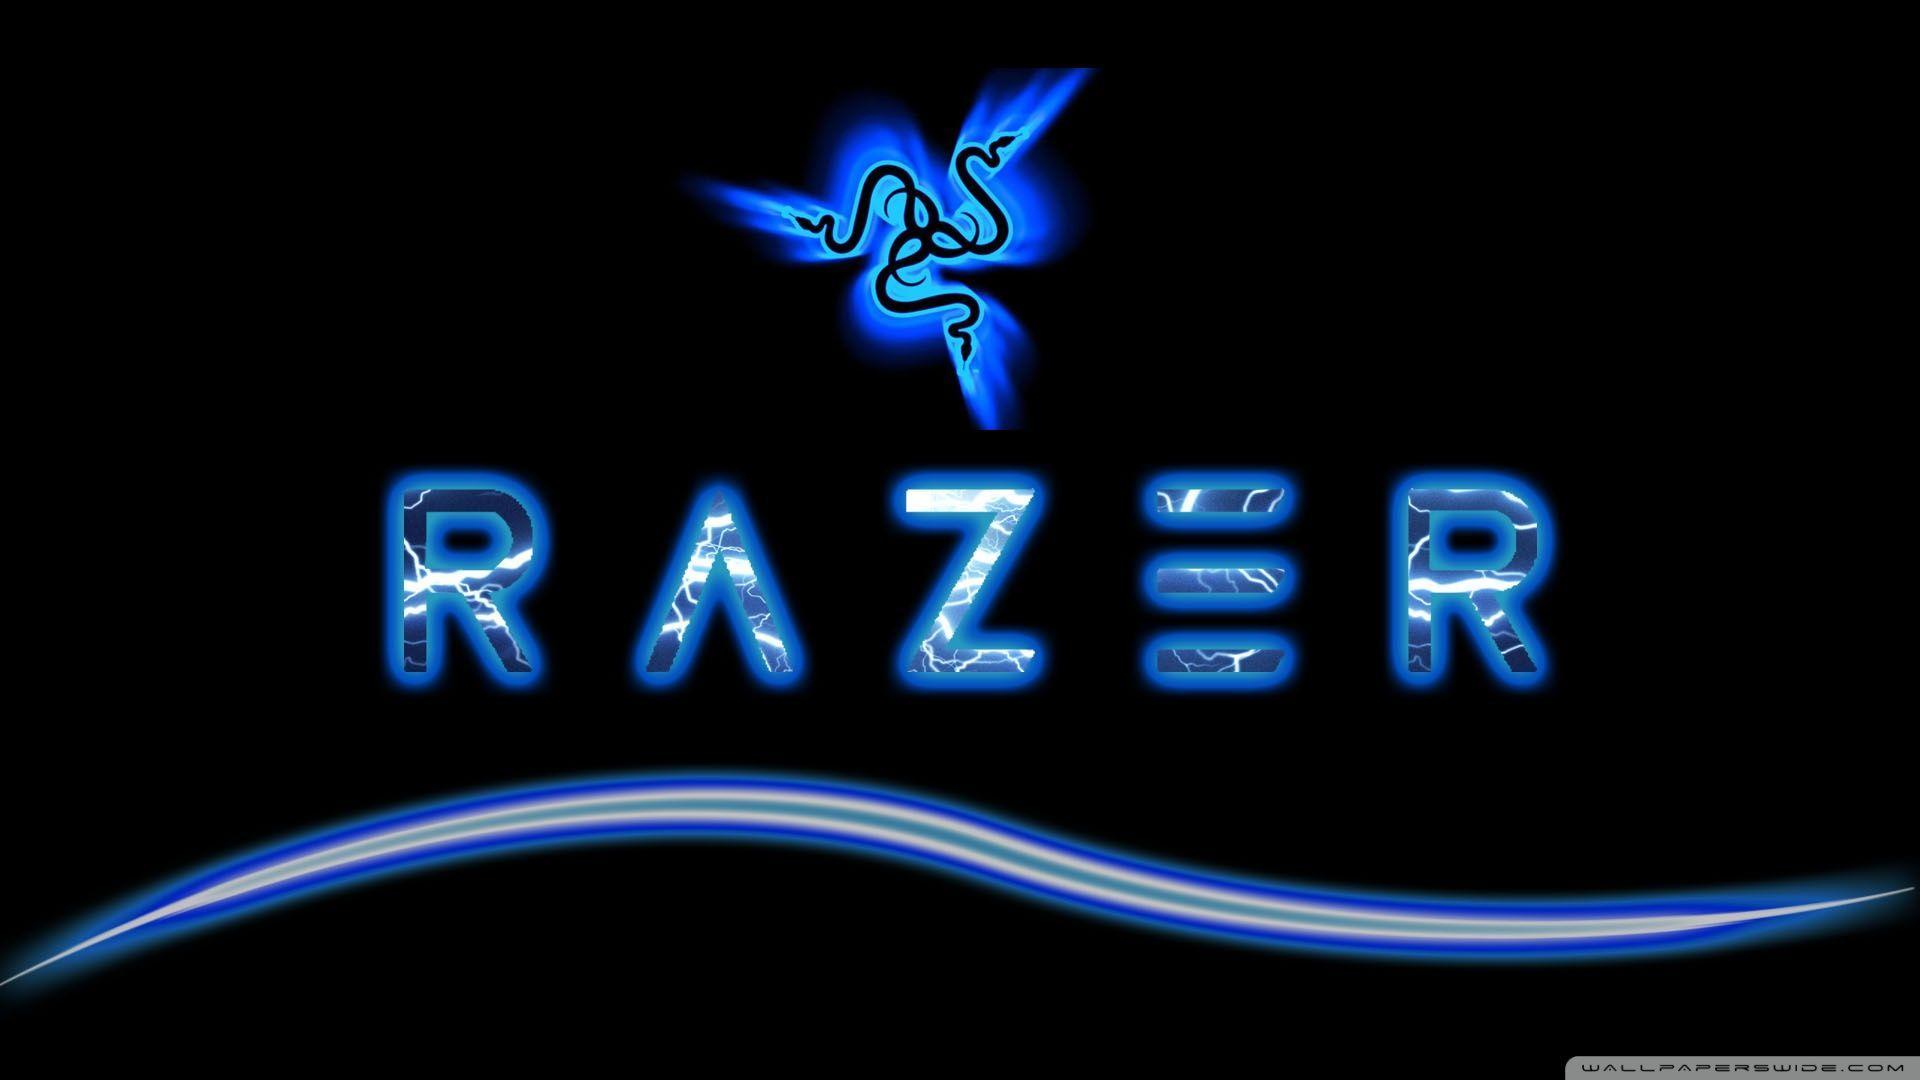 Wallpaper Hd Razer Desktop Wallpaper 4k